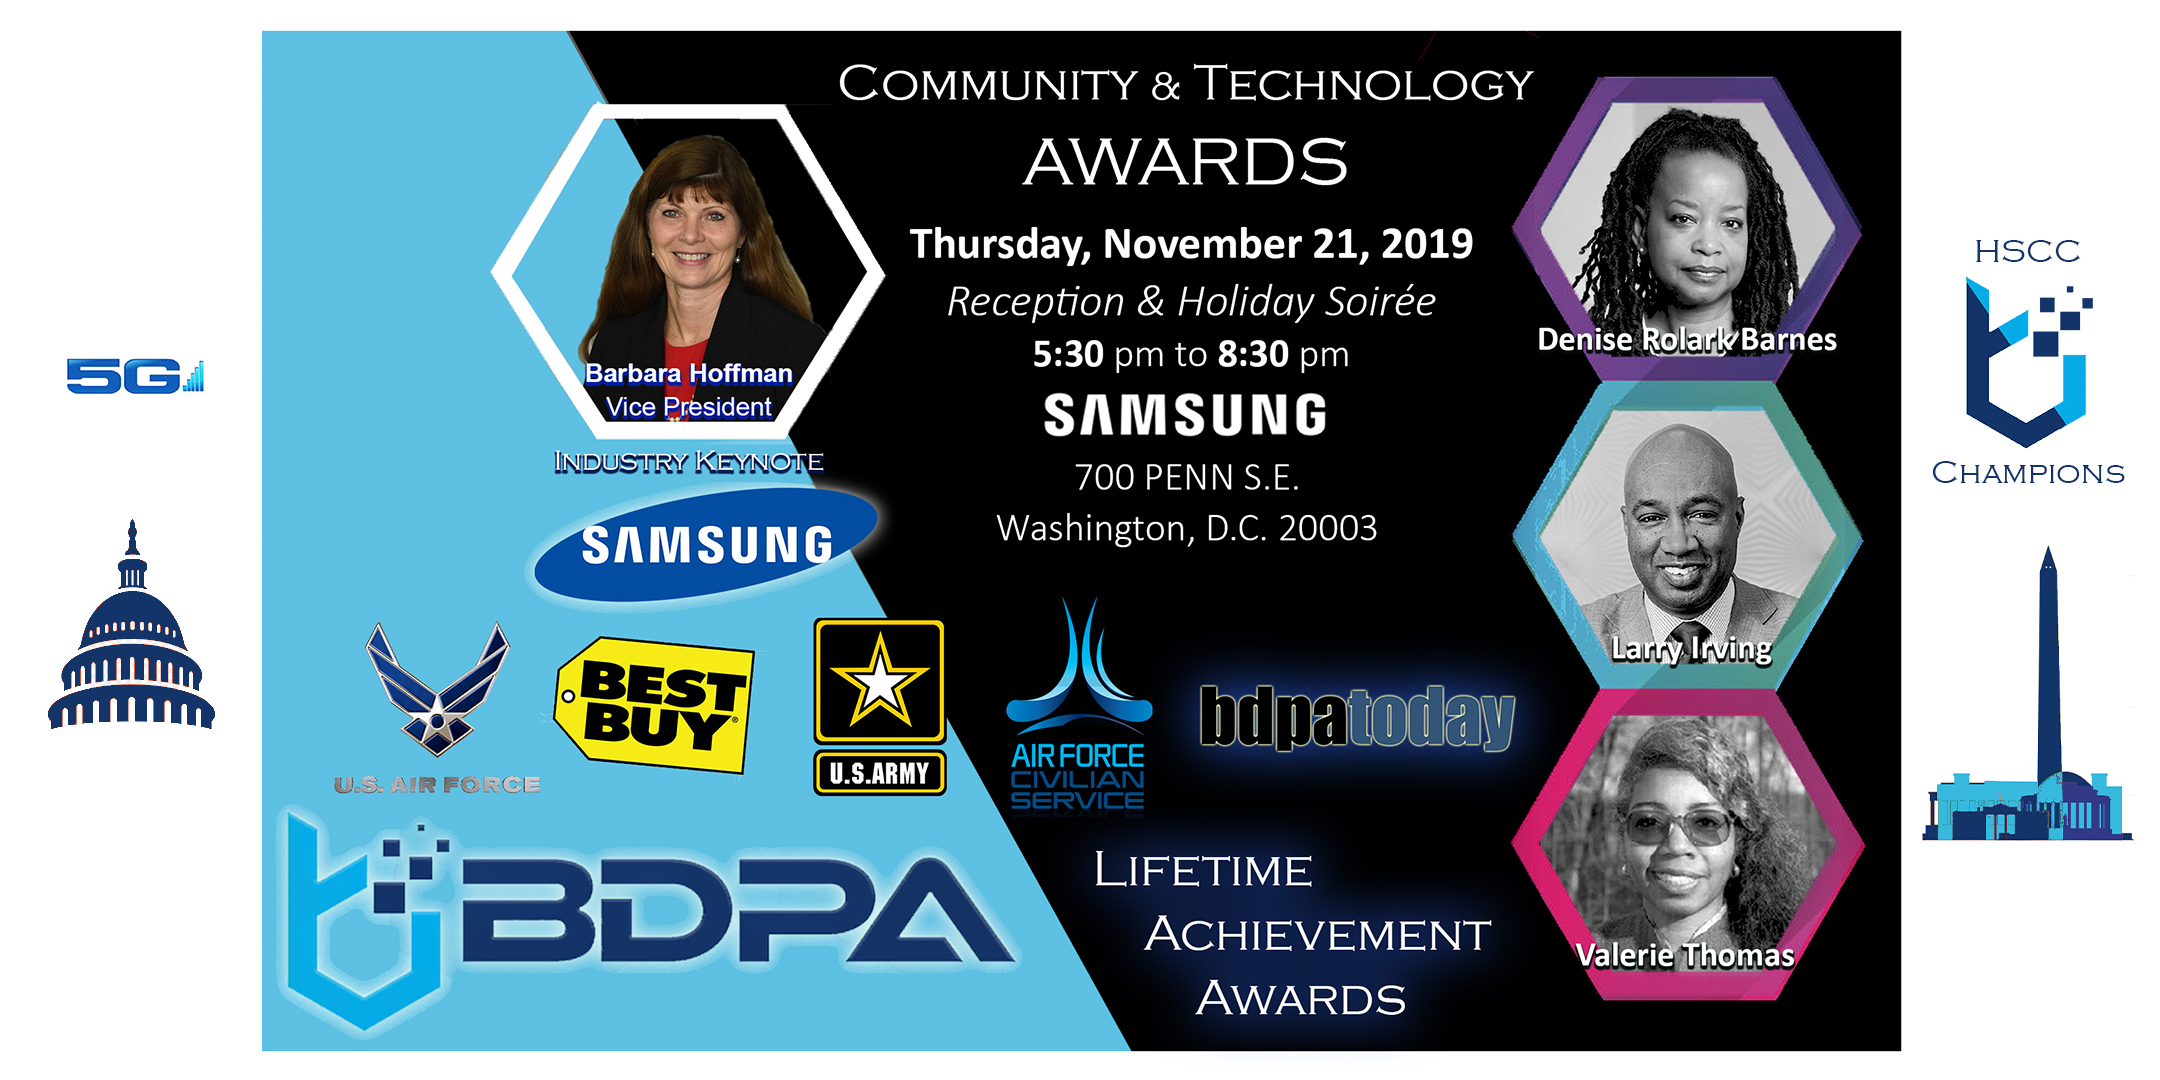 2019 Community & Technology Awards